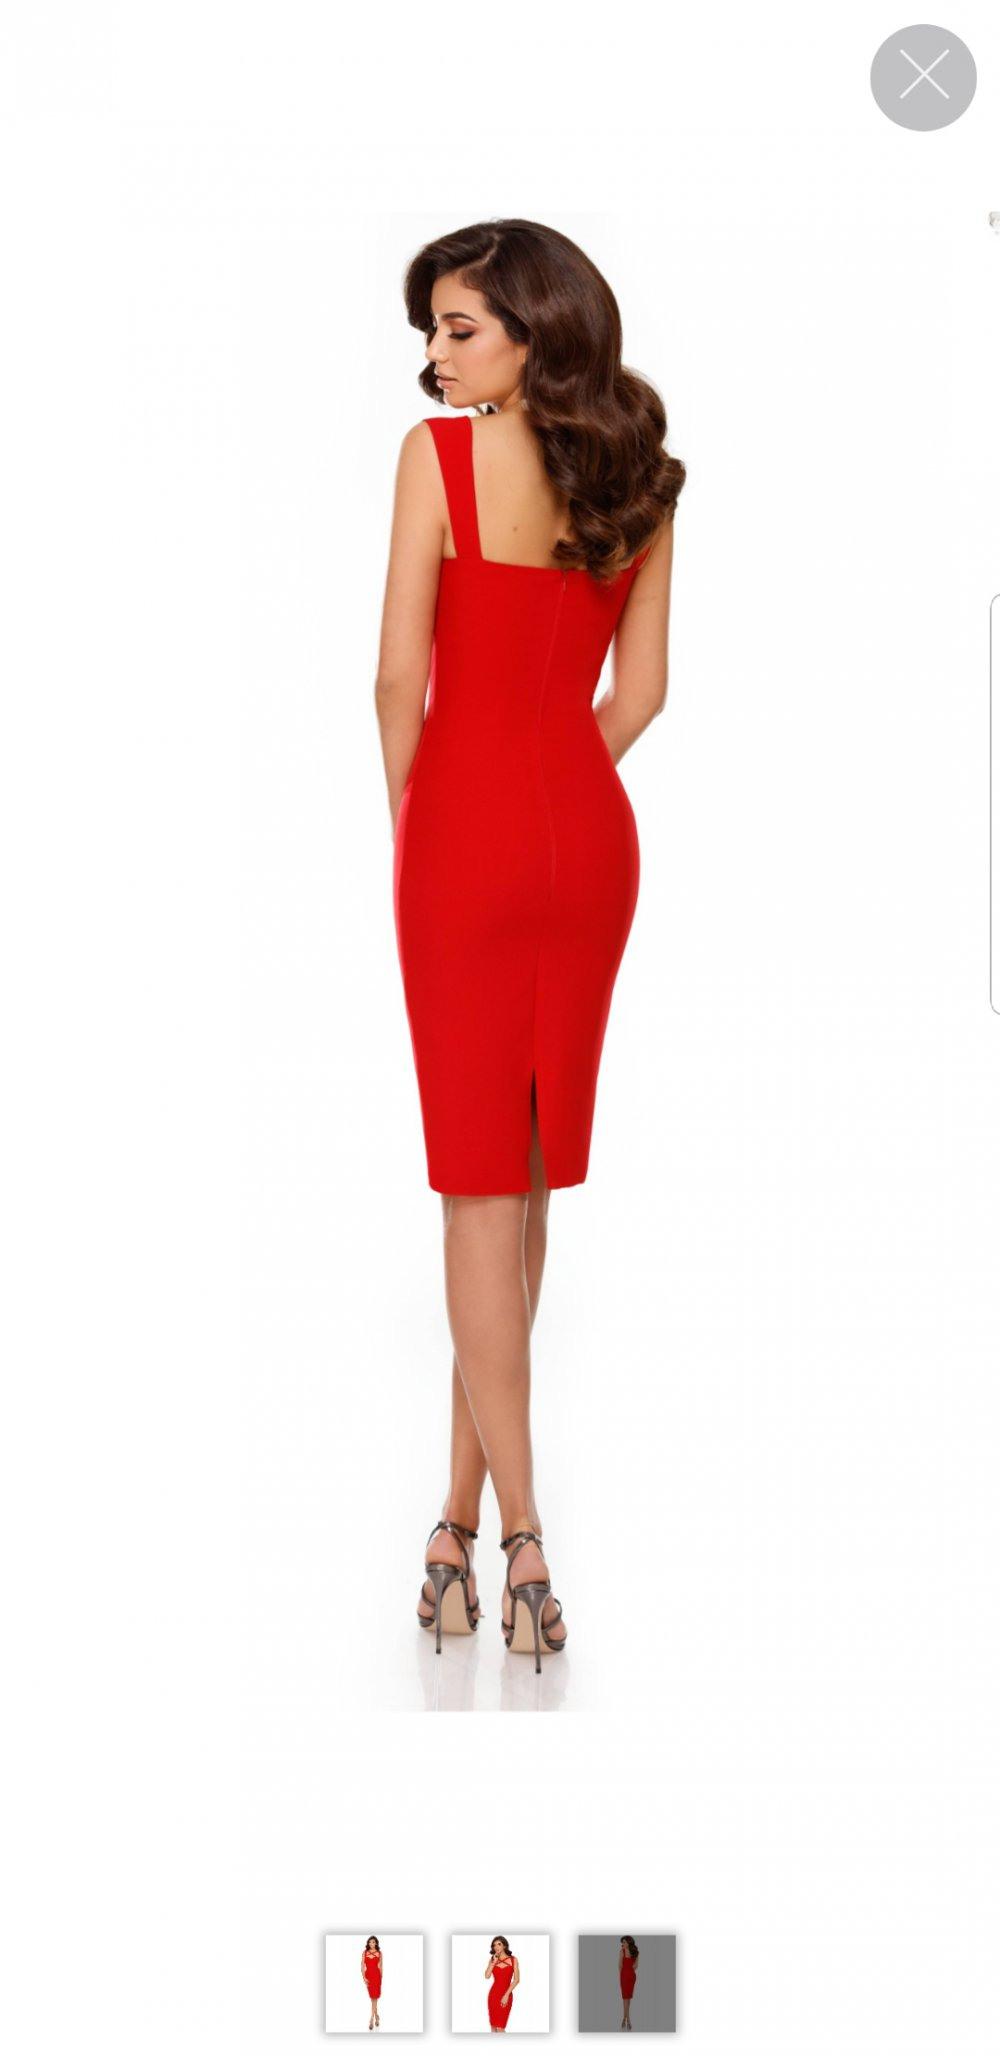 10 Einzigartig Rotes Kleid Kurz DesignFormal Cool Rotes Kleid Kurz Spezialgebiet